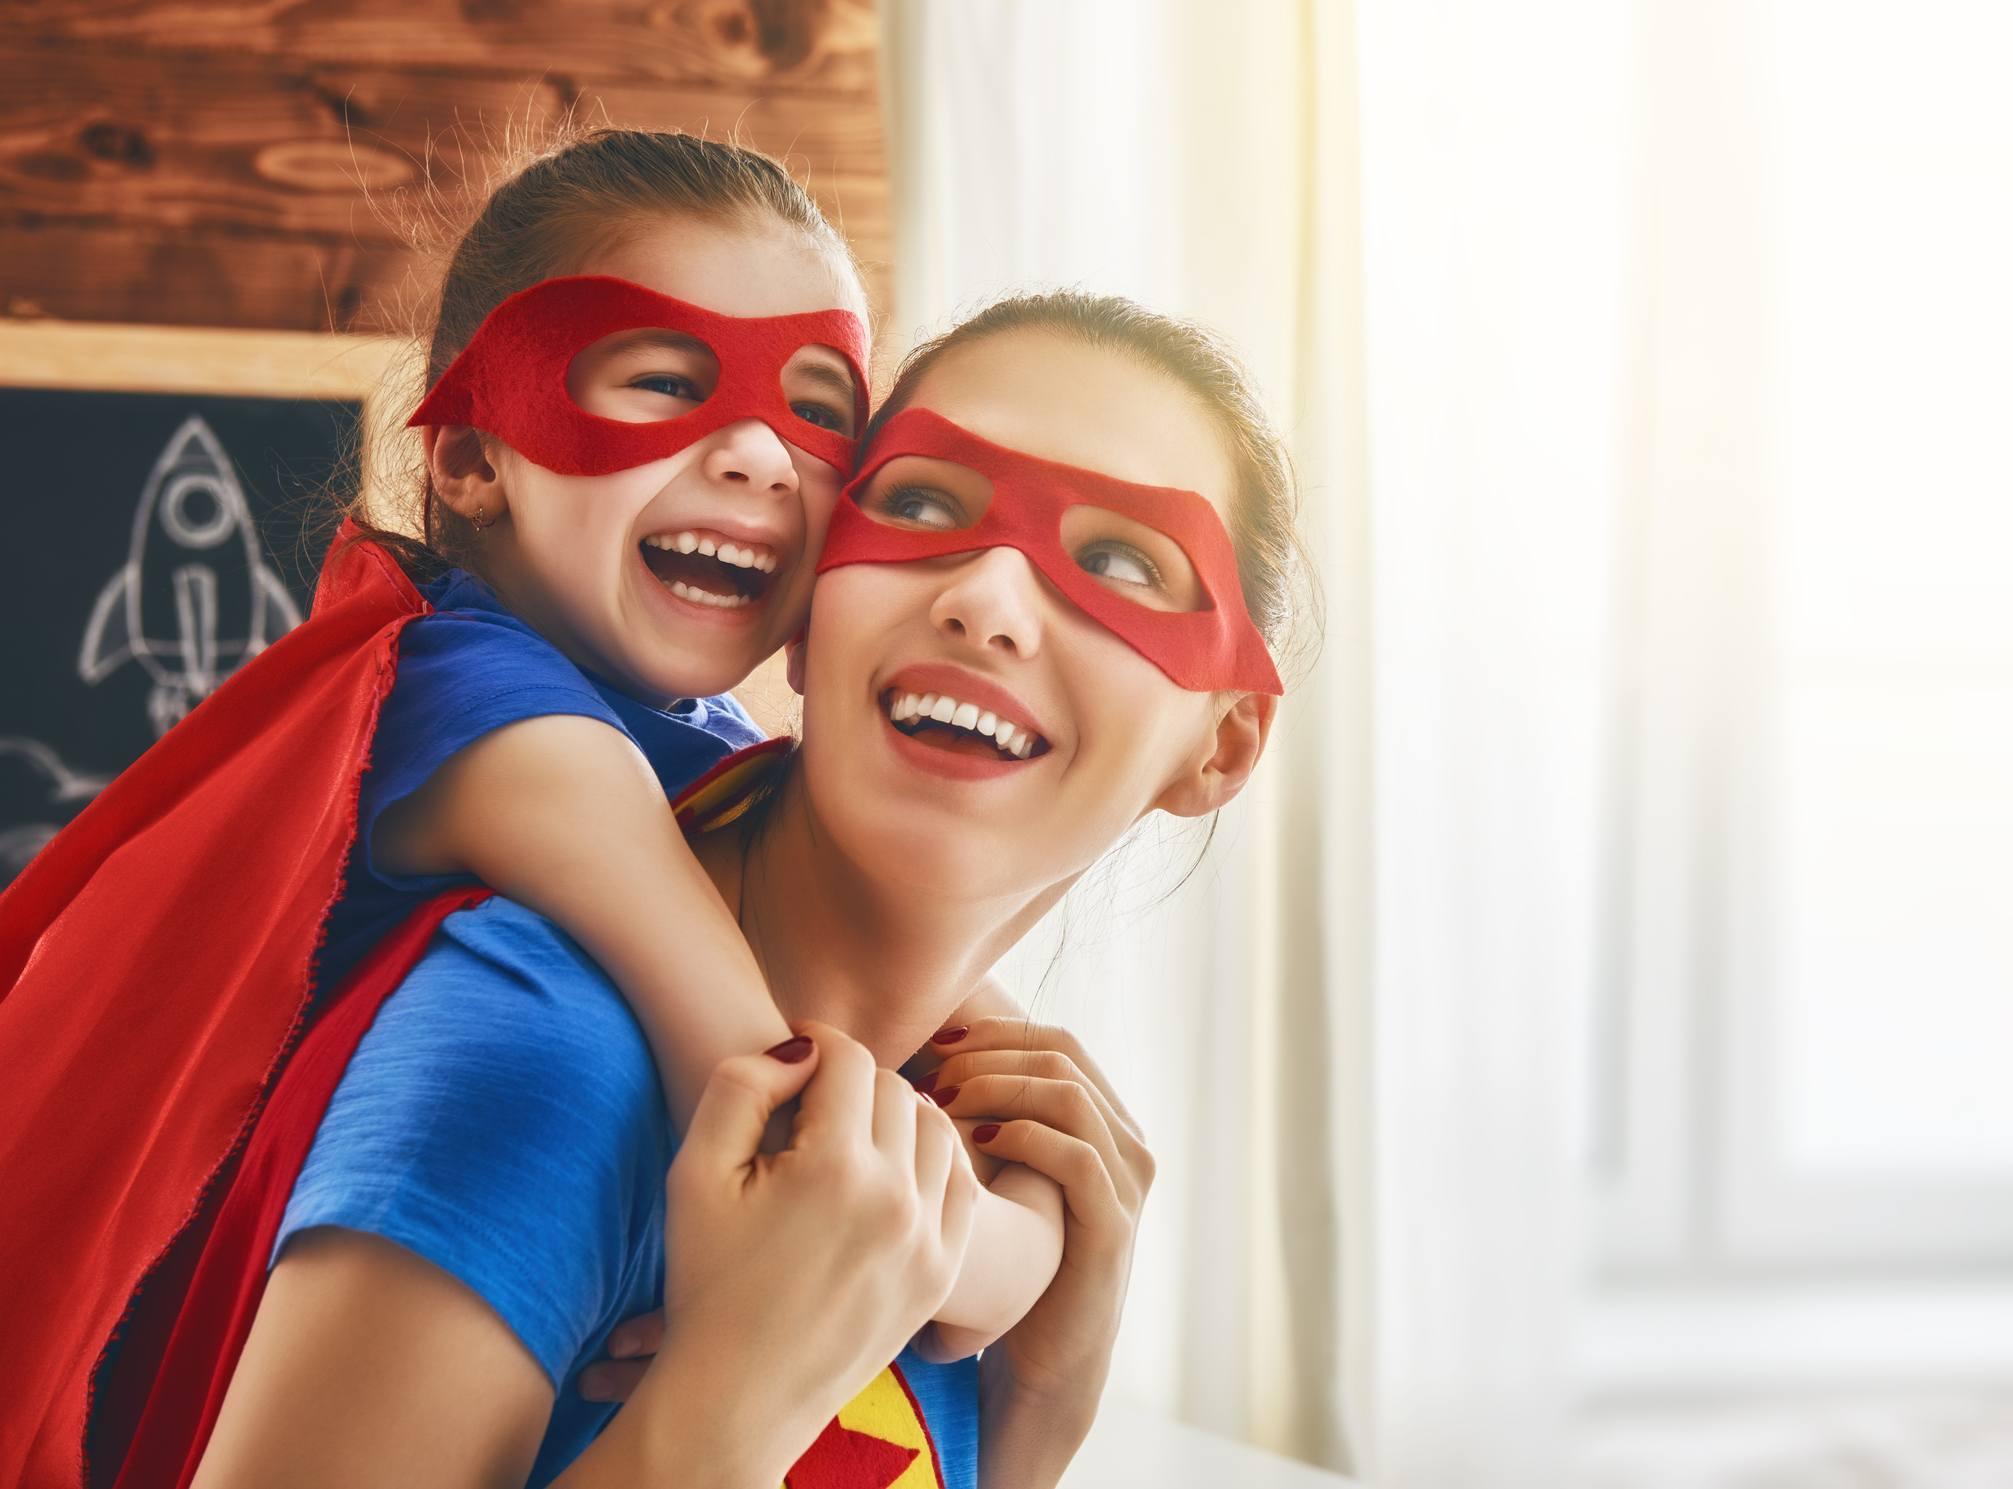 Girl and mom in Superhero costume